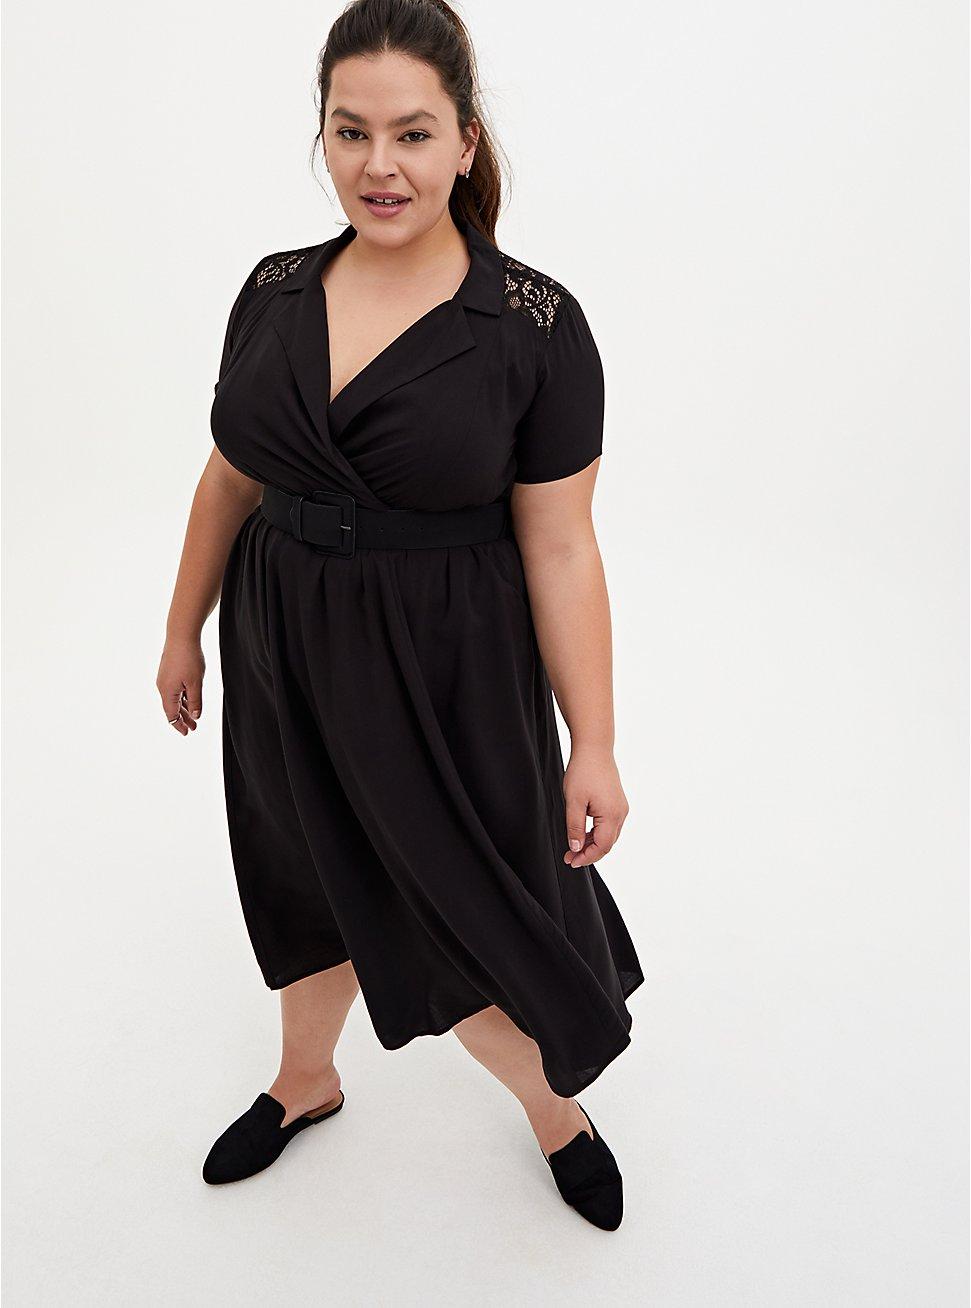 Black Stretch Challis Lace Midi Shirt Dress, DEEP BLACK, hi-res